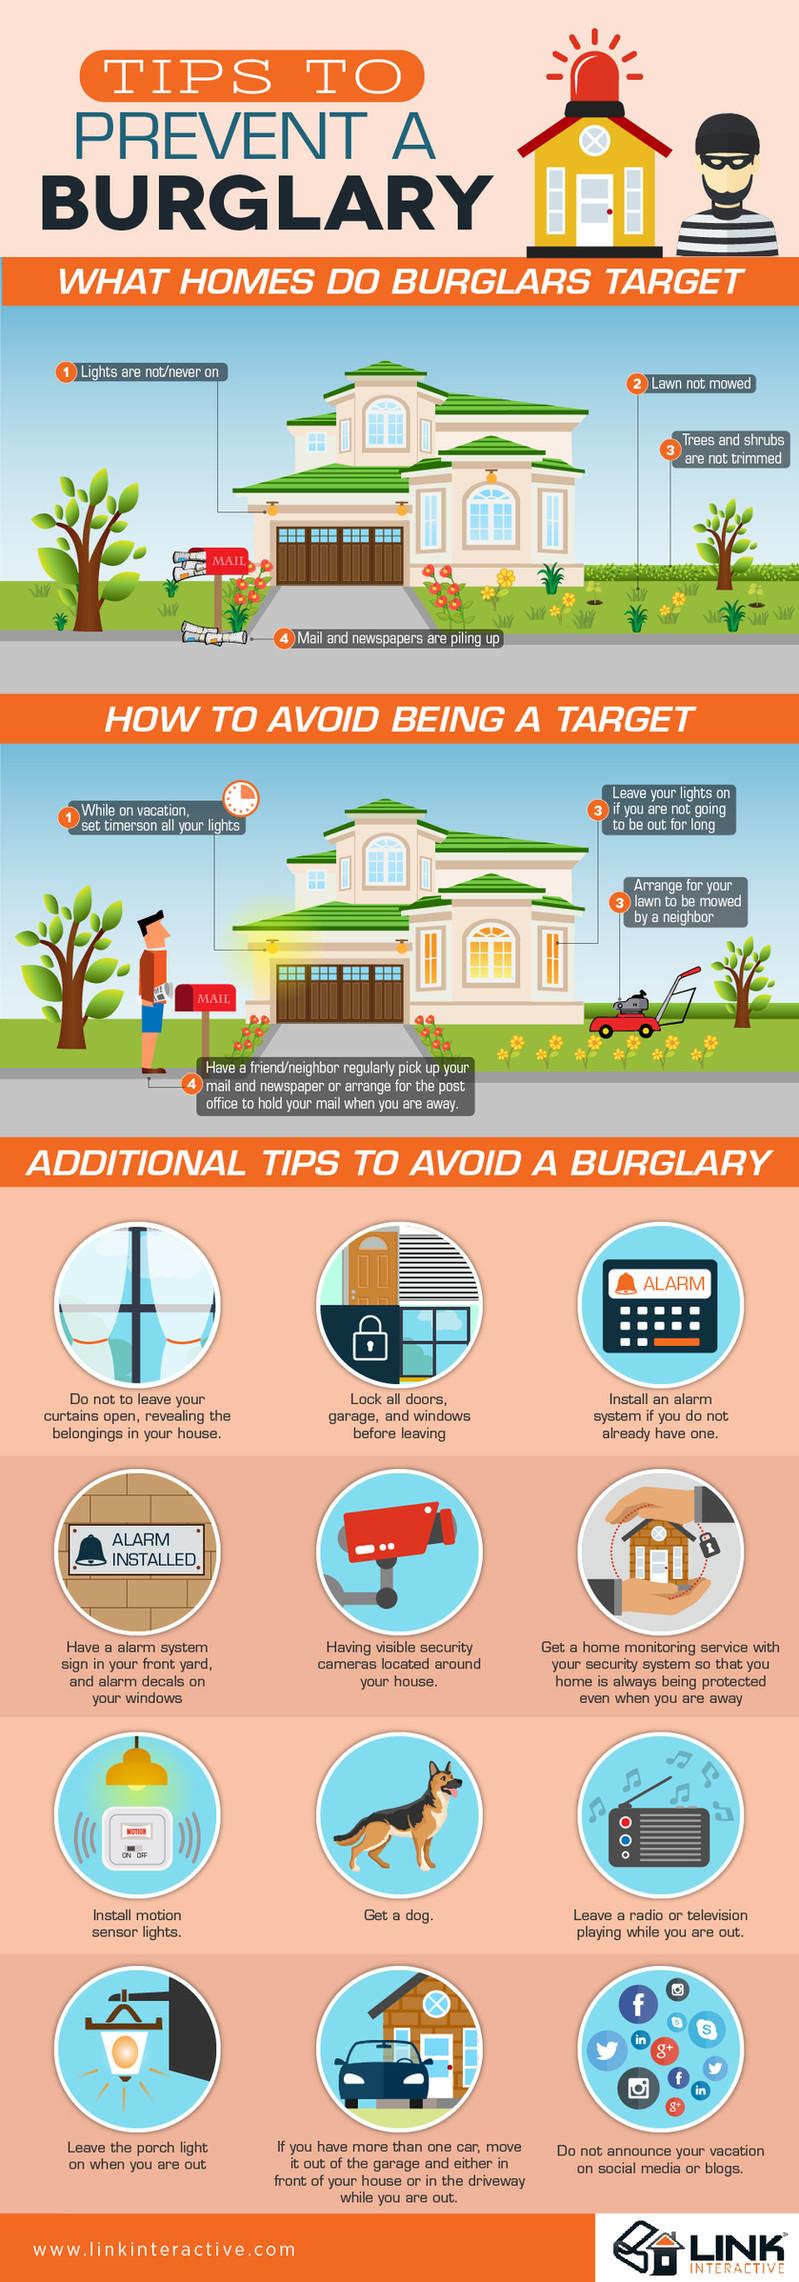 Tips to Prevent Burglary